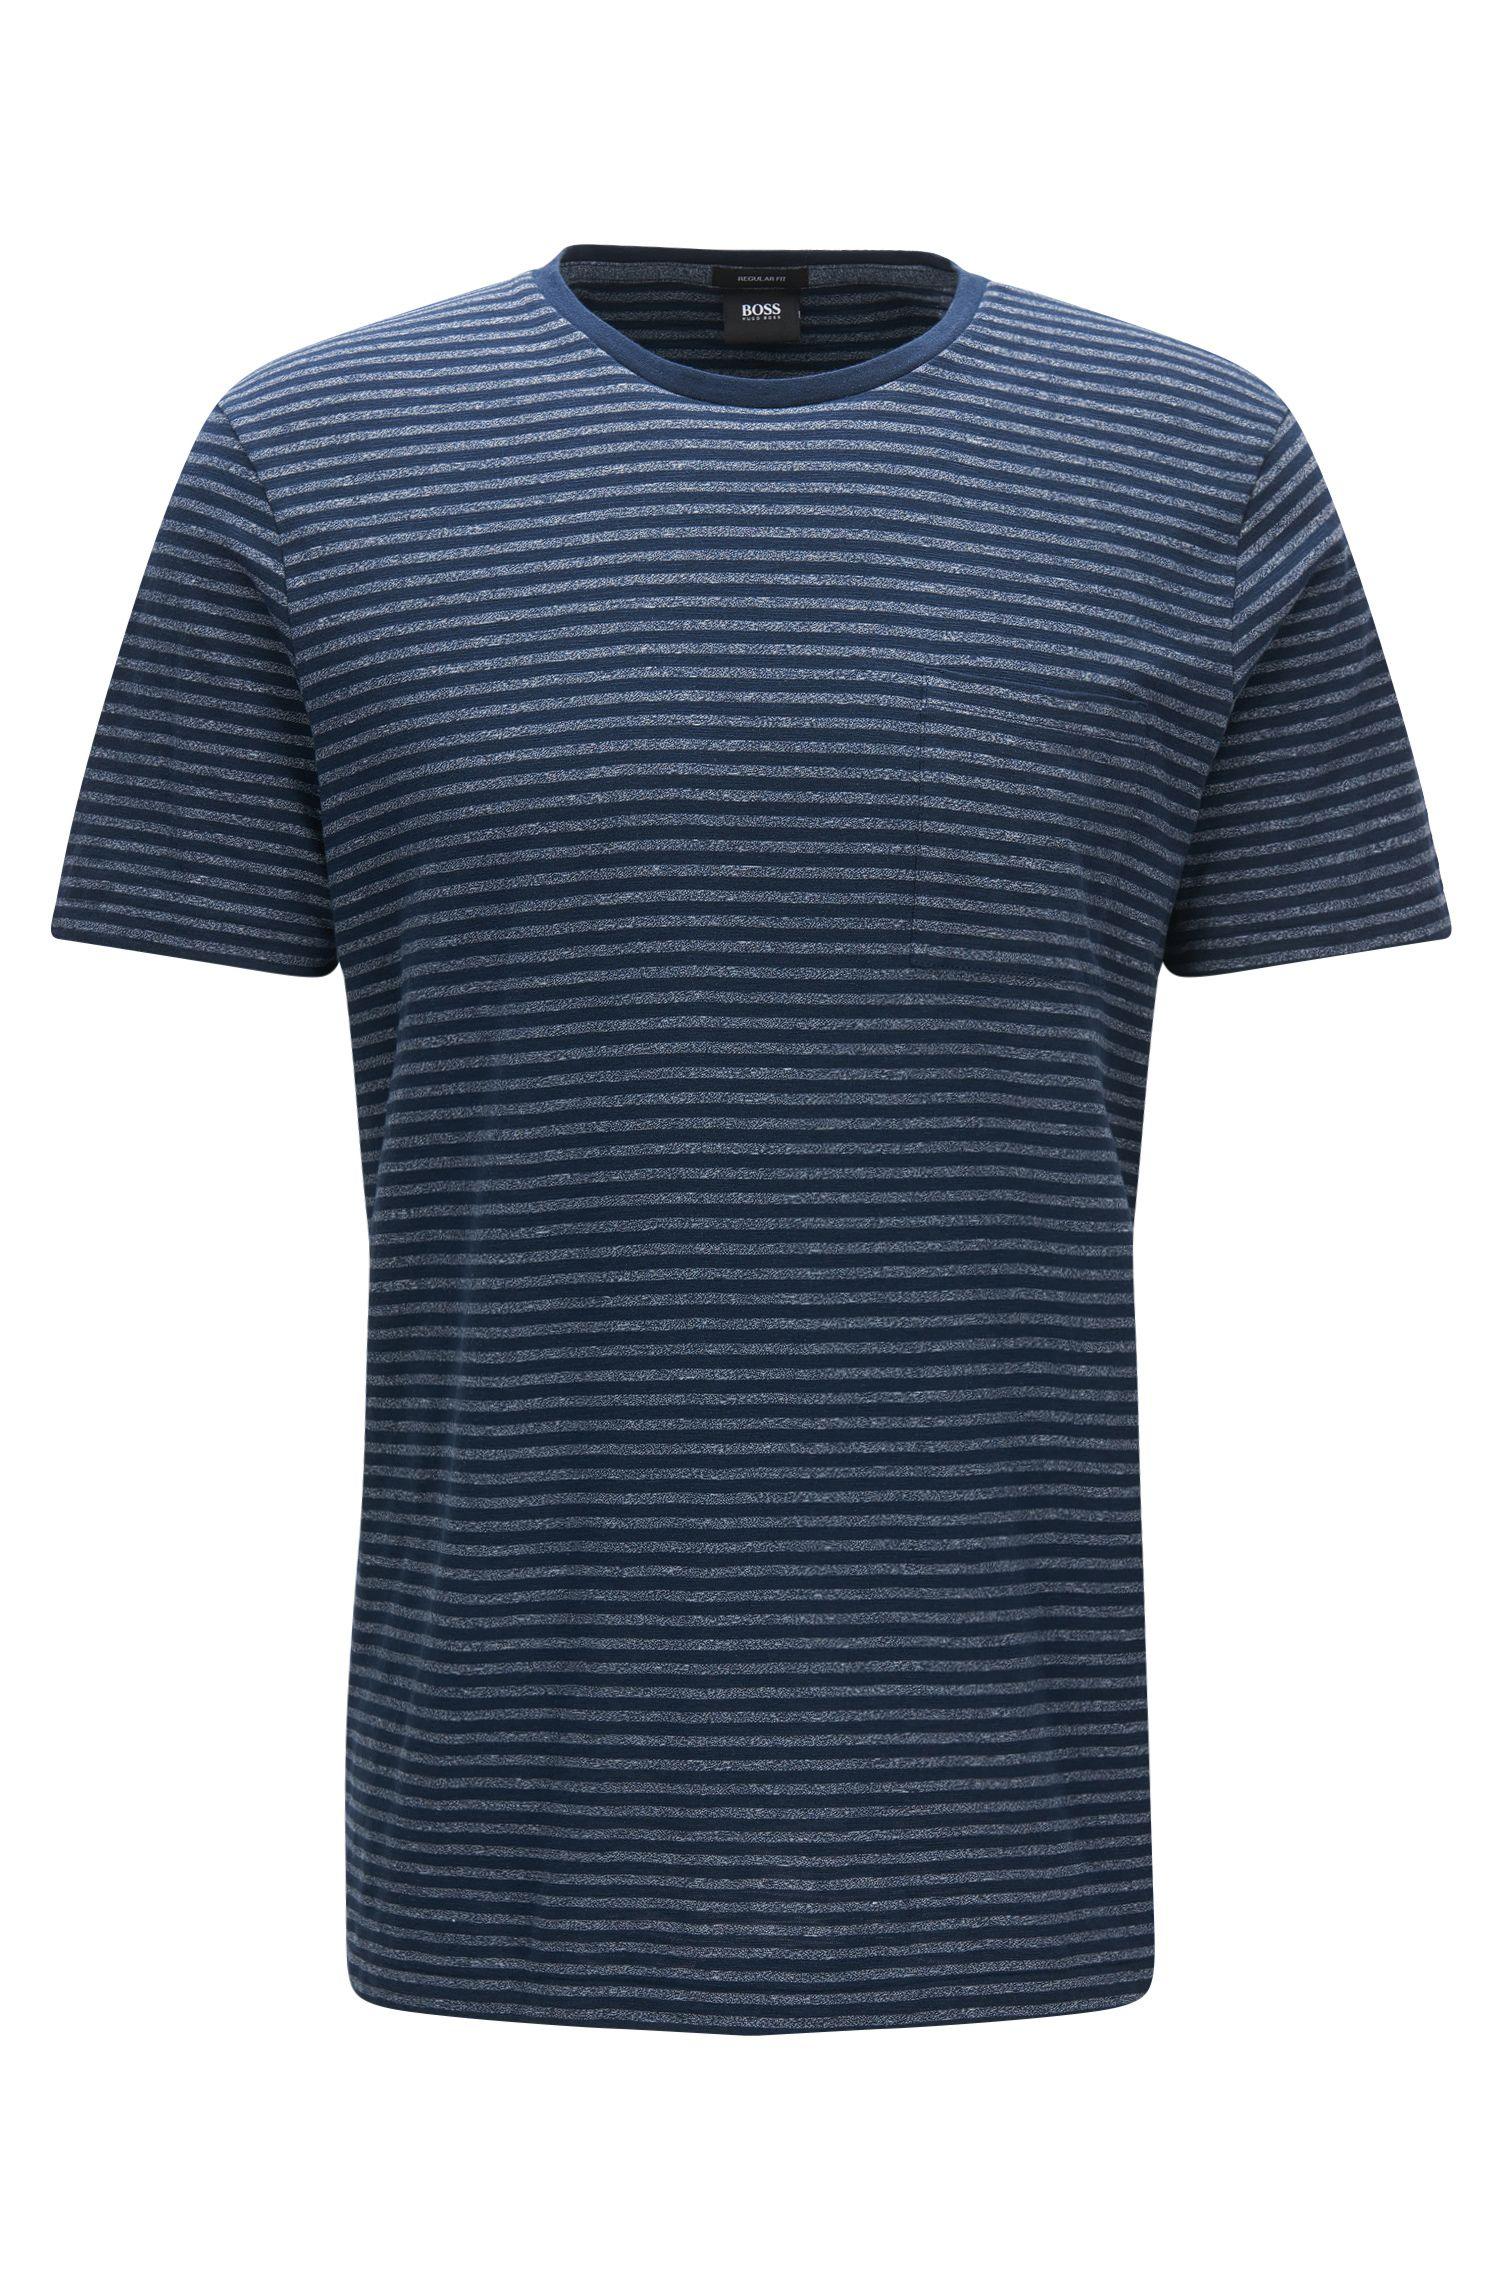 Camiseta regular fit en mezcla de algodón con tejido mouliné a rayas